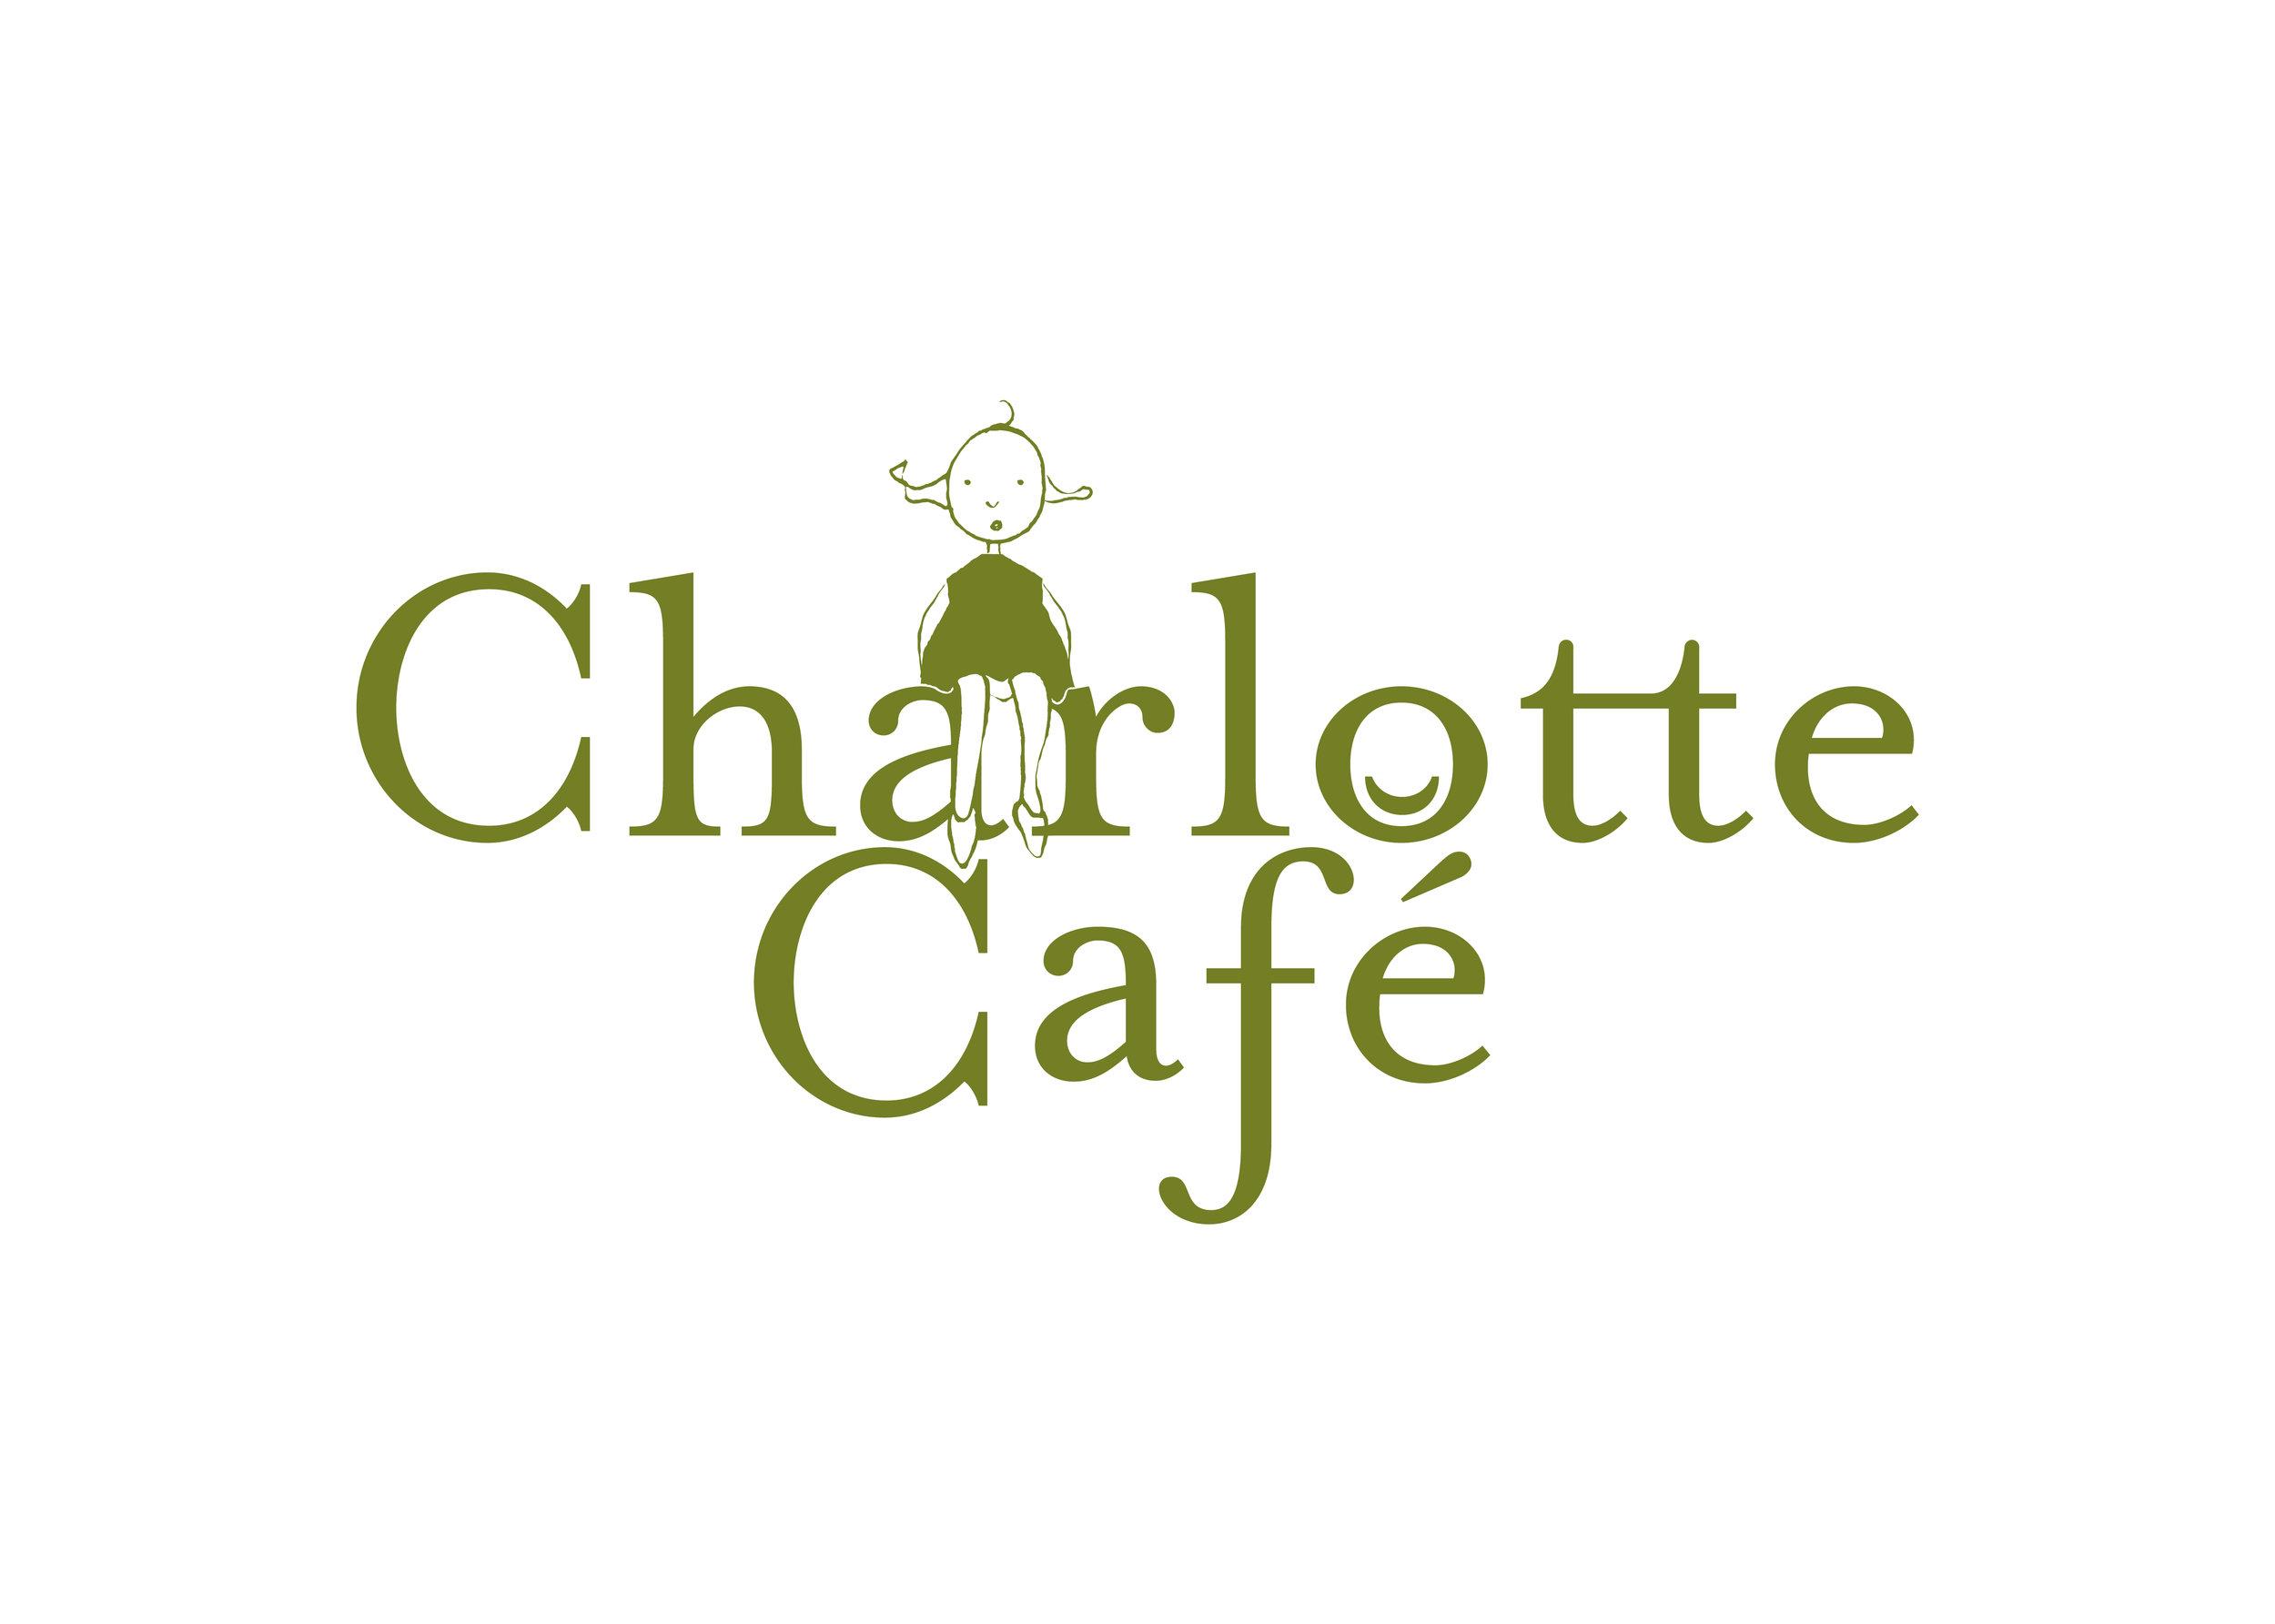 Charlotte Cafe   IDENTITY & BRANDING DEVELOPMENT